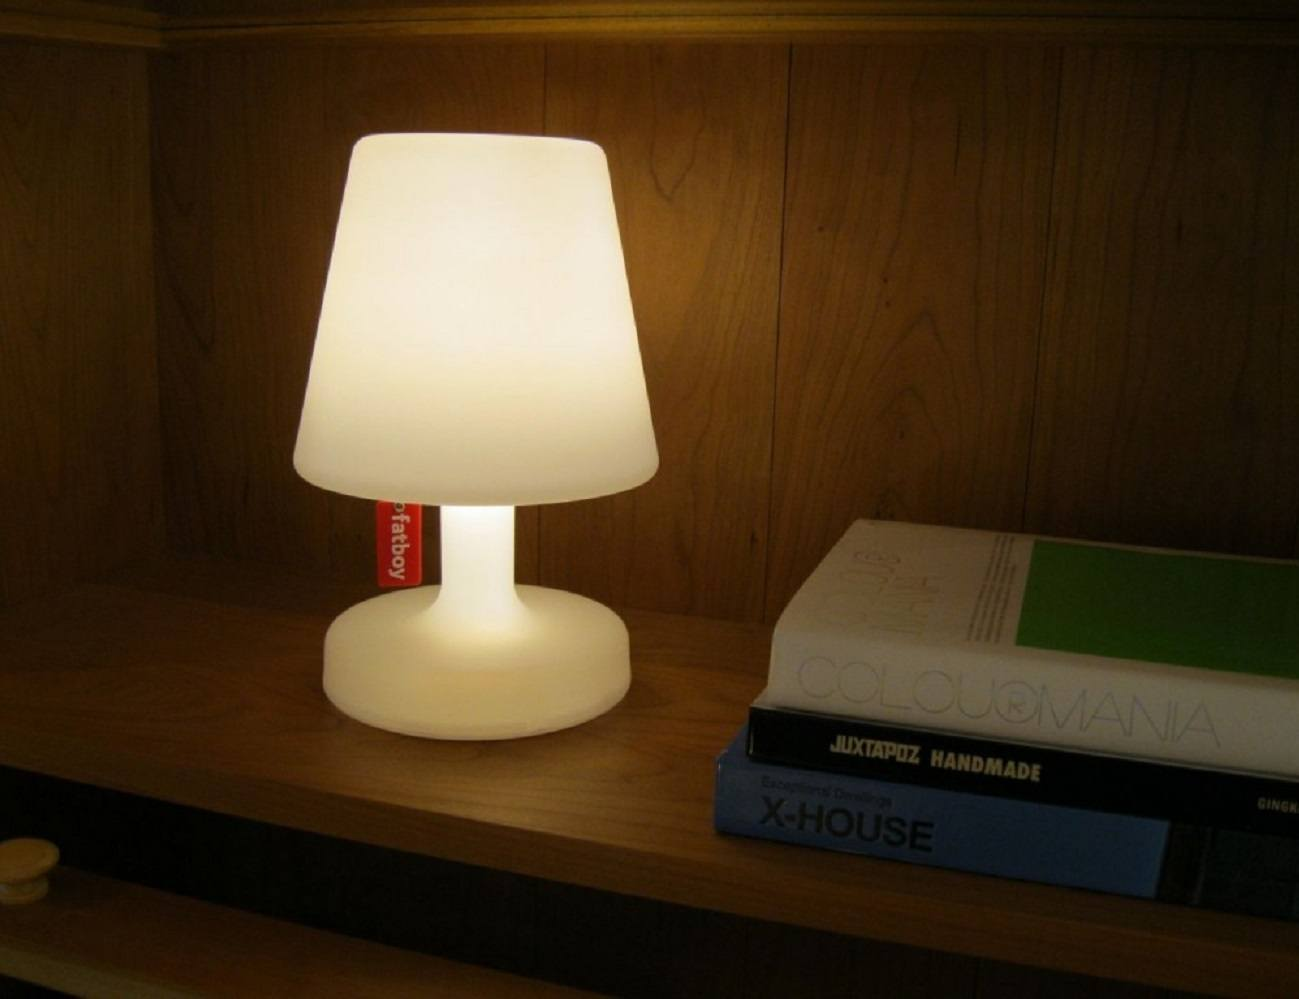 Bezaubernd Fatboy Petit Referenz Von Edison The Lamp